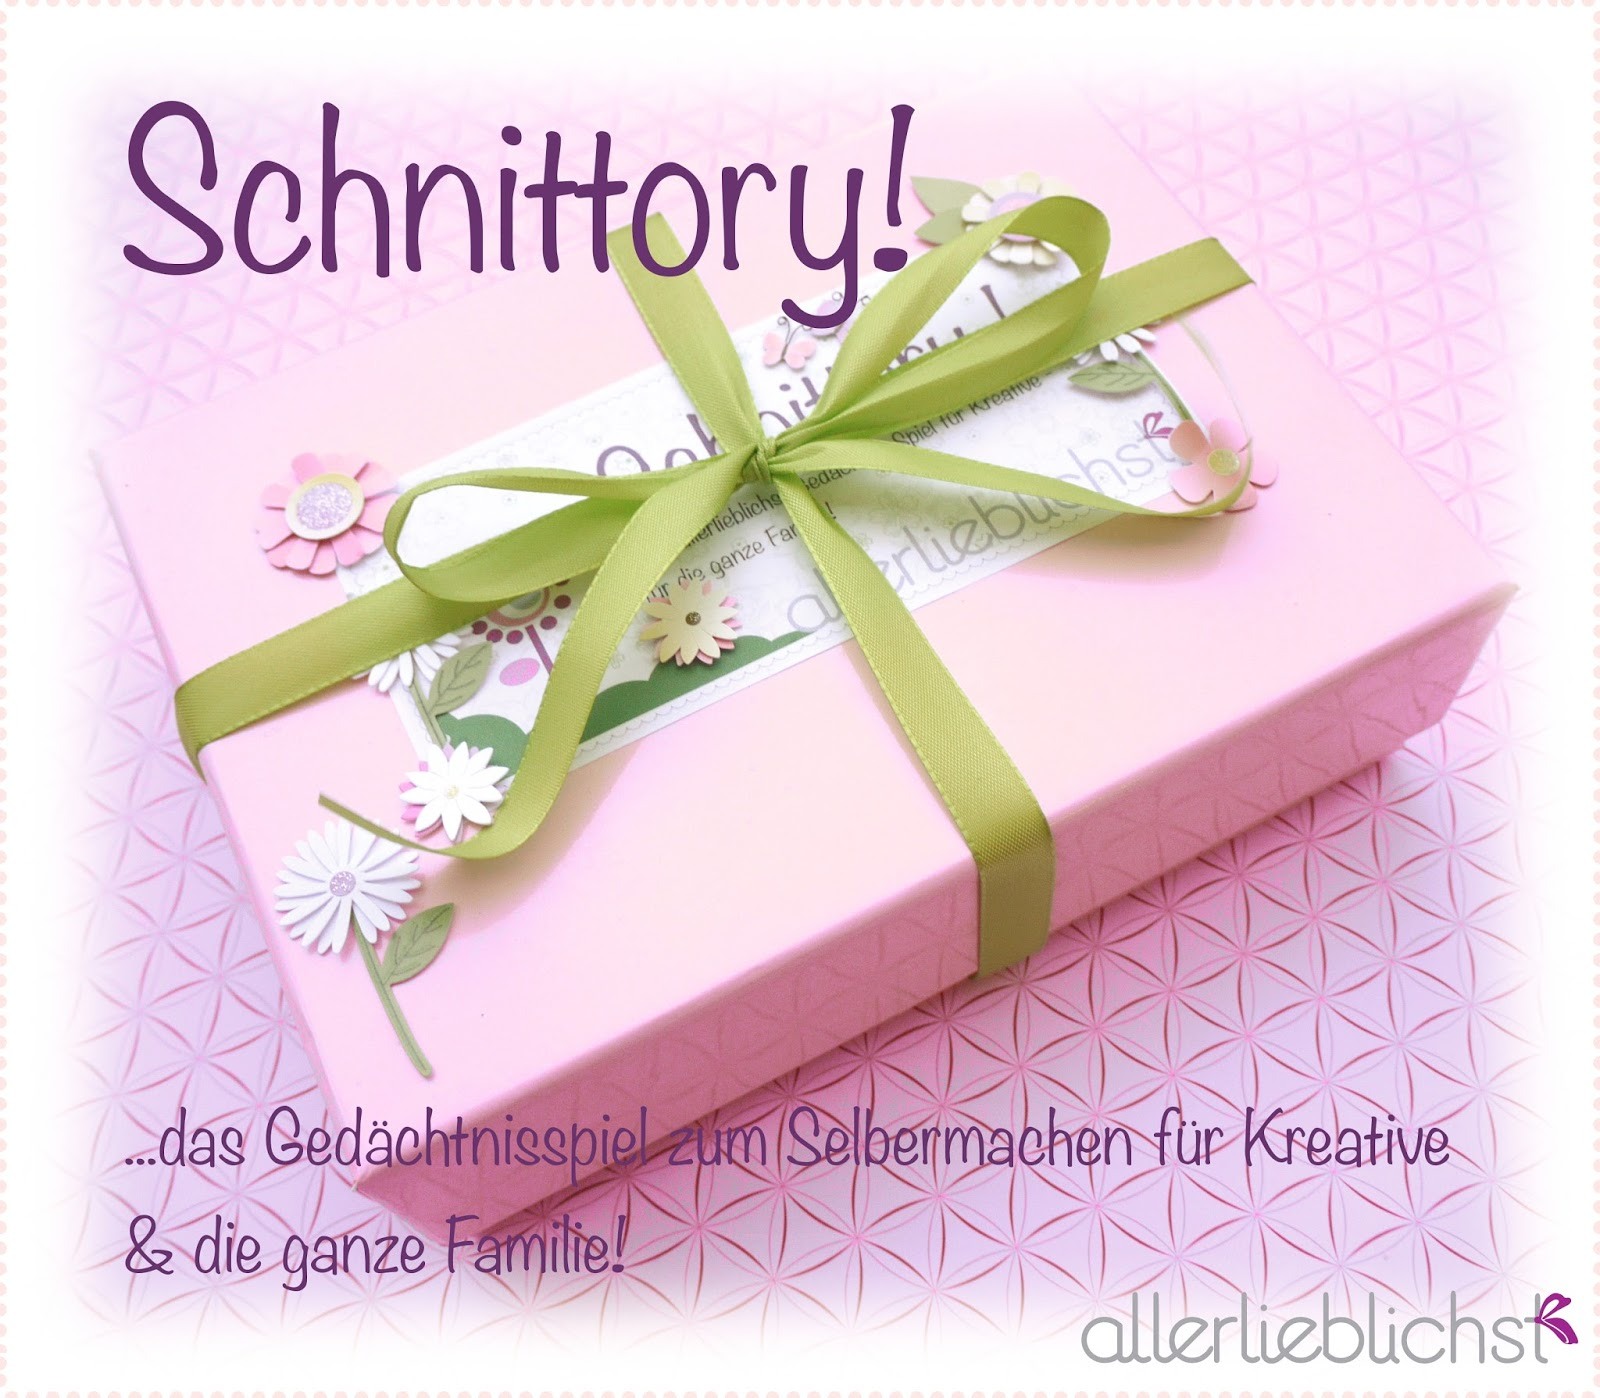 zum gratis Download Schnittory!